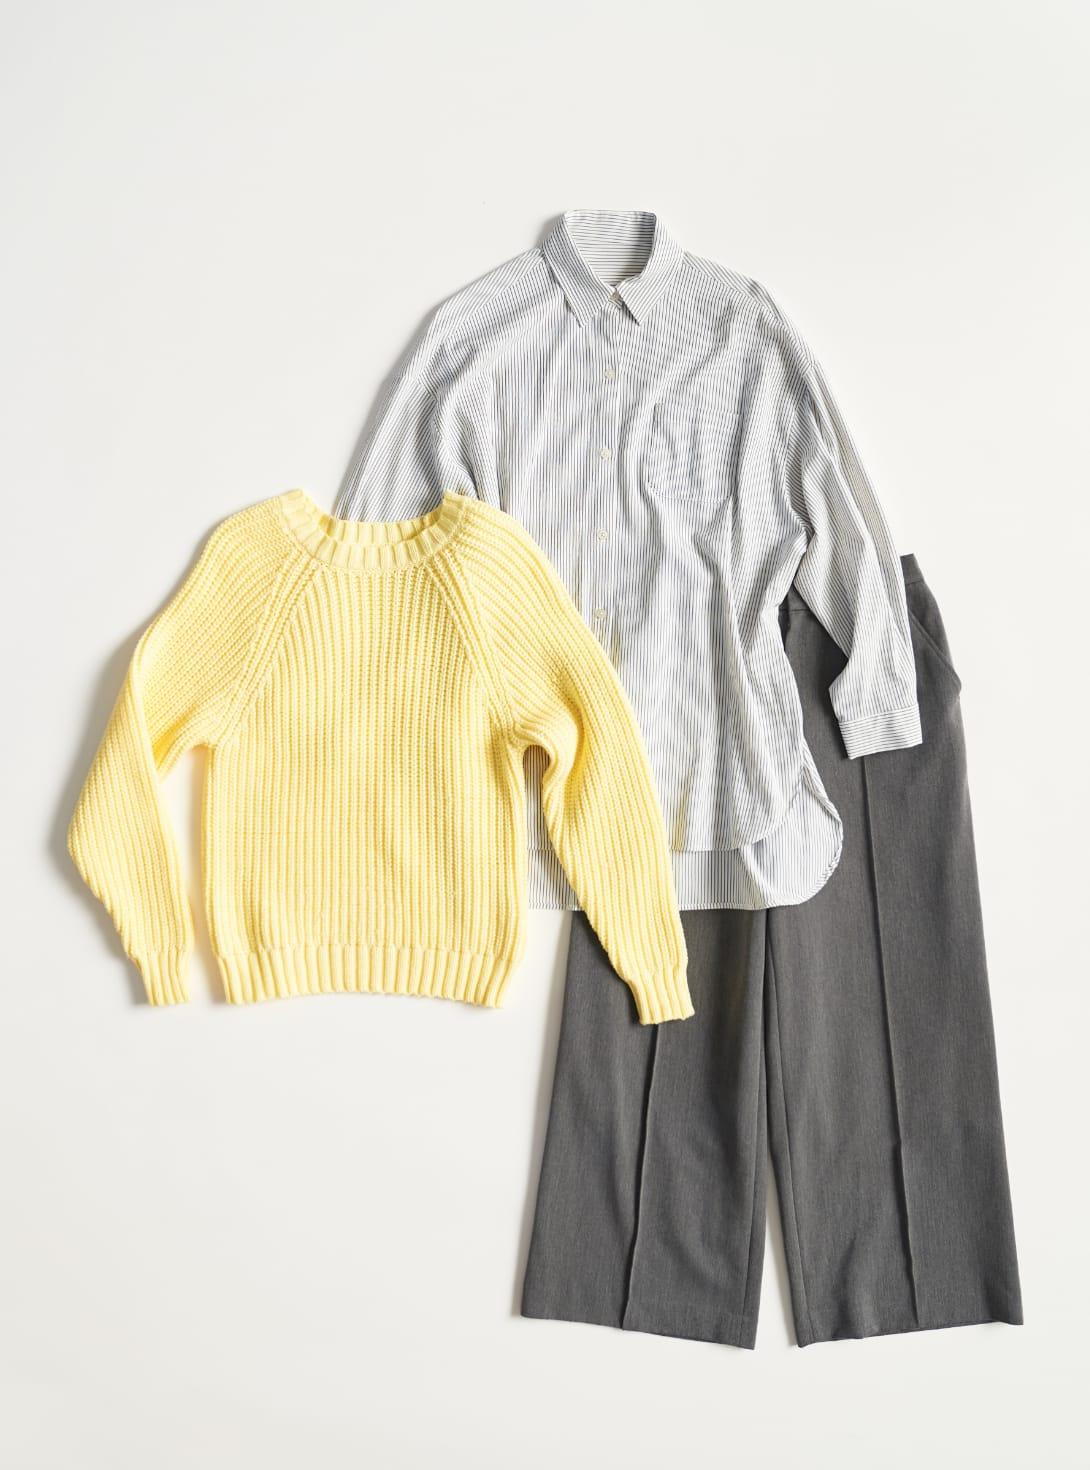 stylist_1_item画像